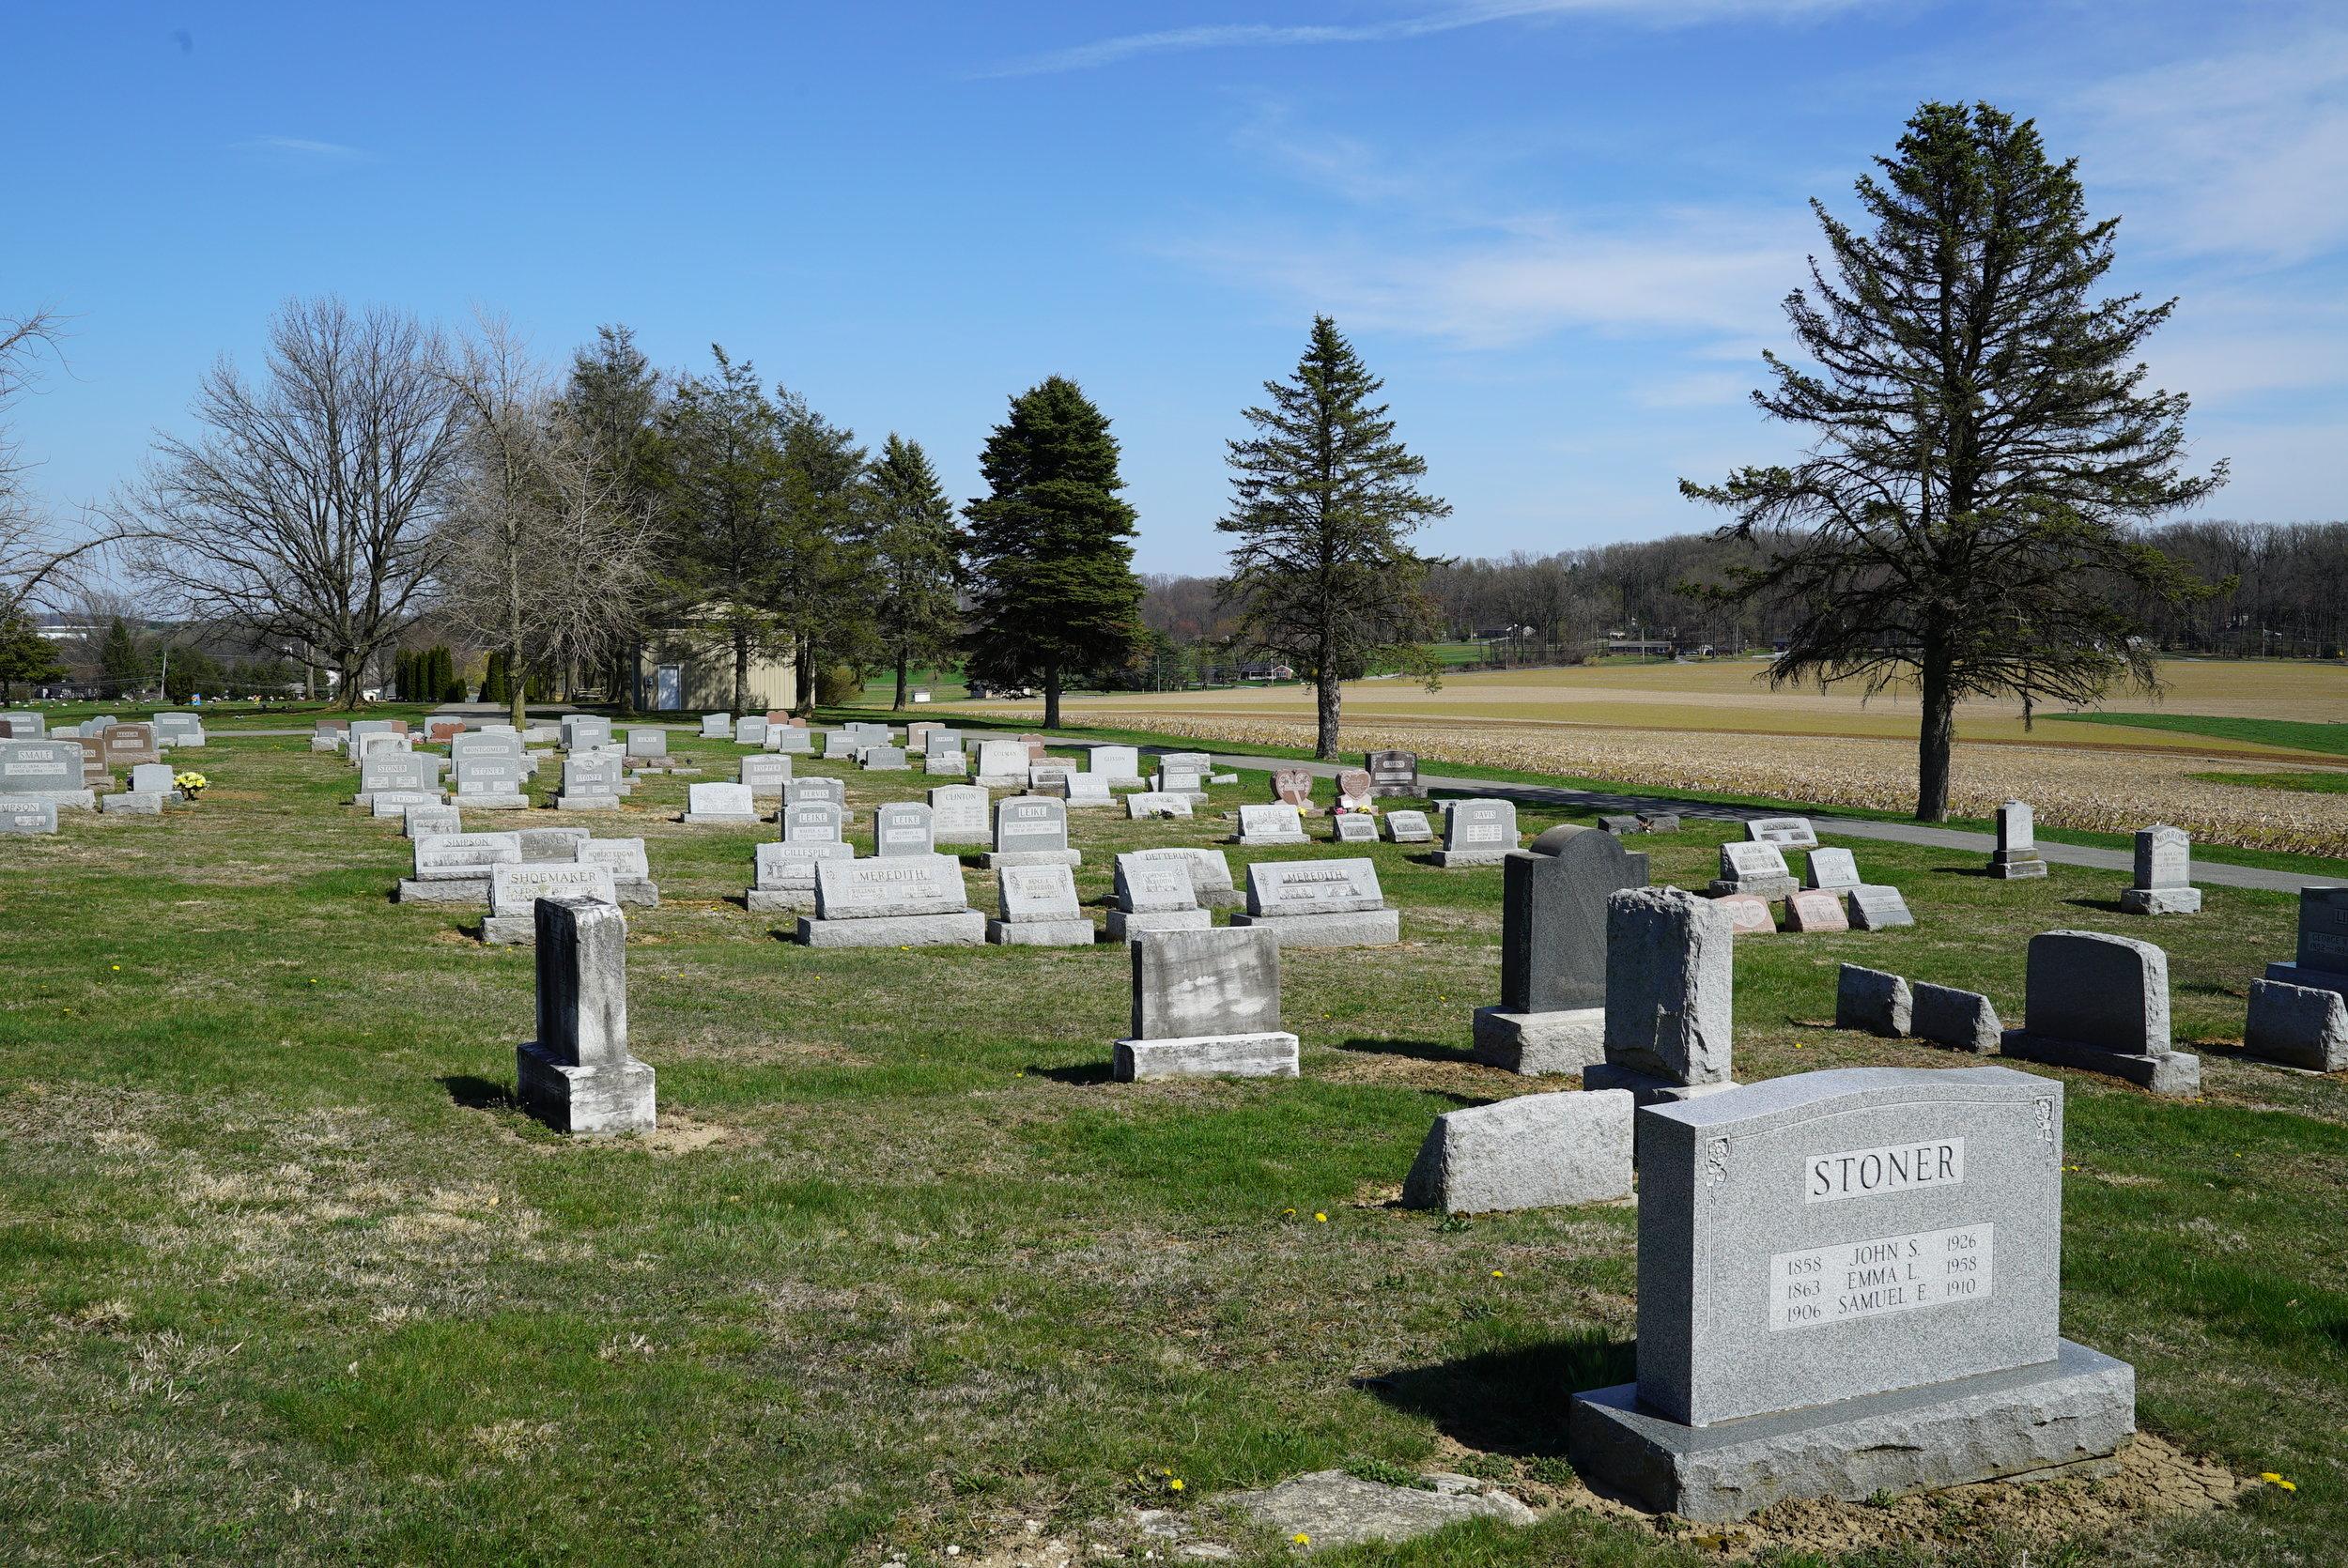 Upper Octorara Presbyterian Church Cemetery. Parkesburg, Pennsylvania.